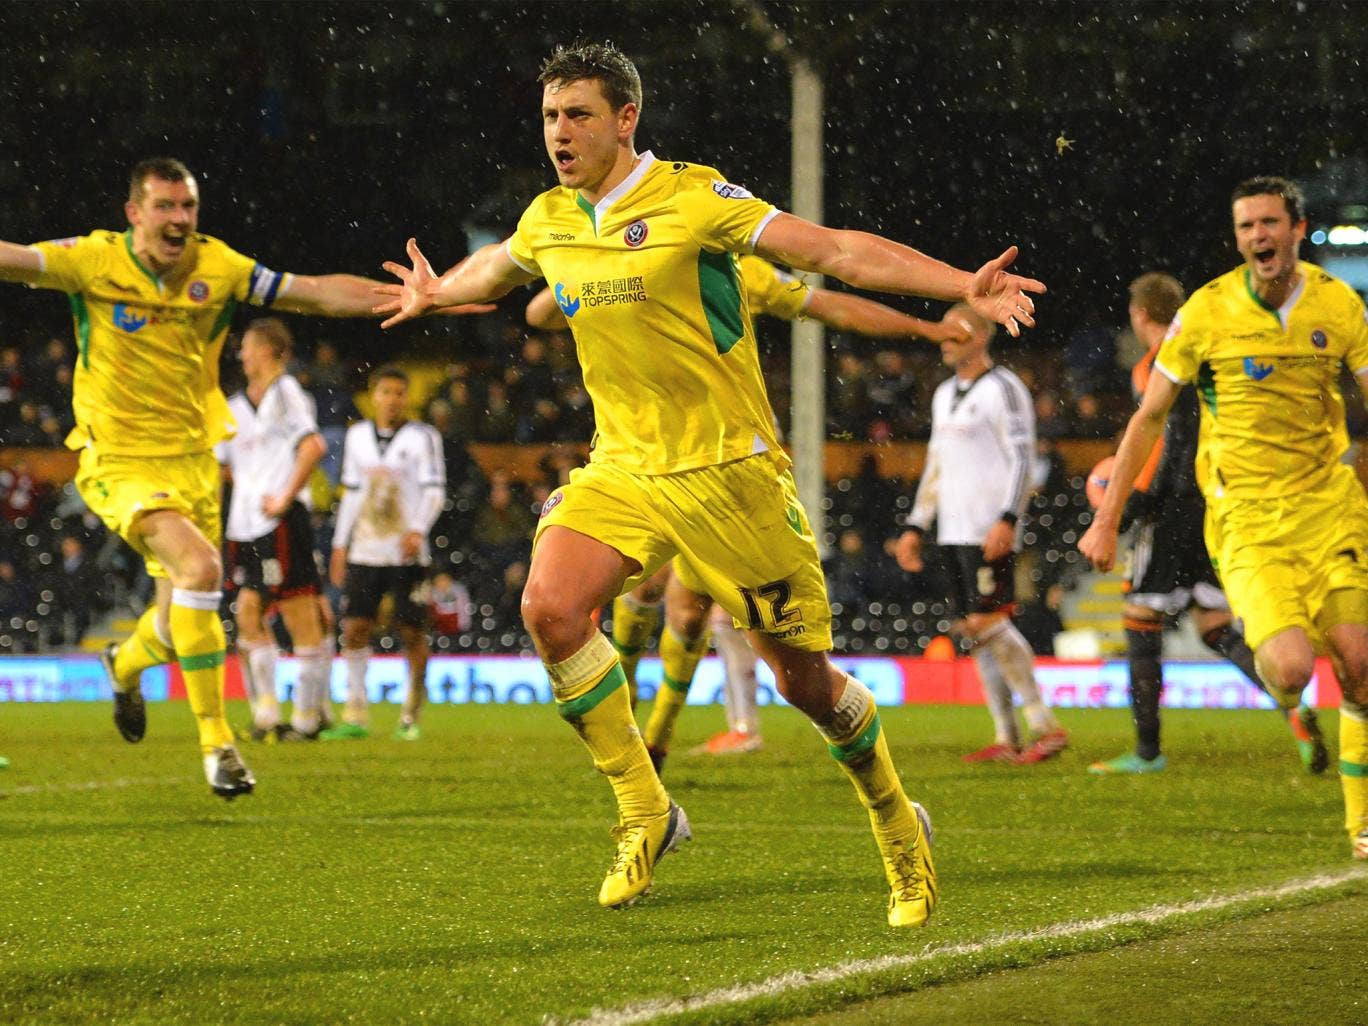 Shaun Miller of Sheffield United celebrates scoring the winning goal